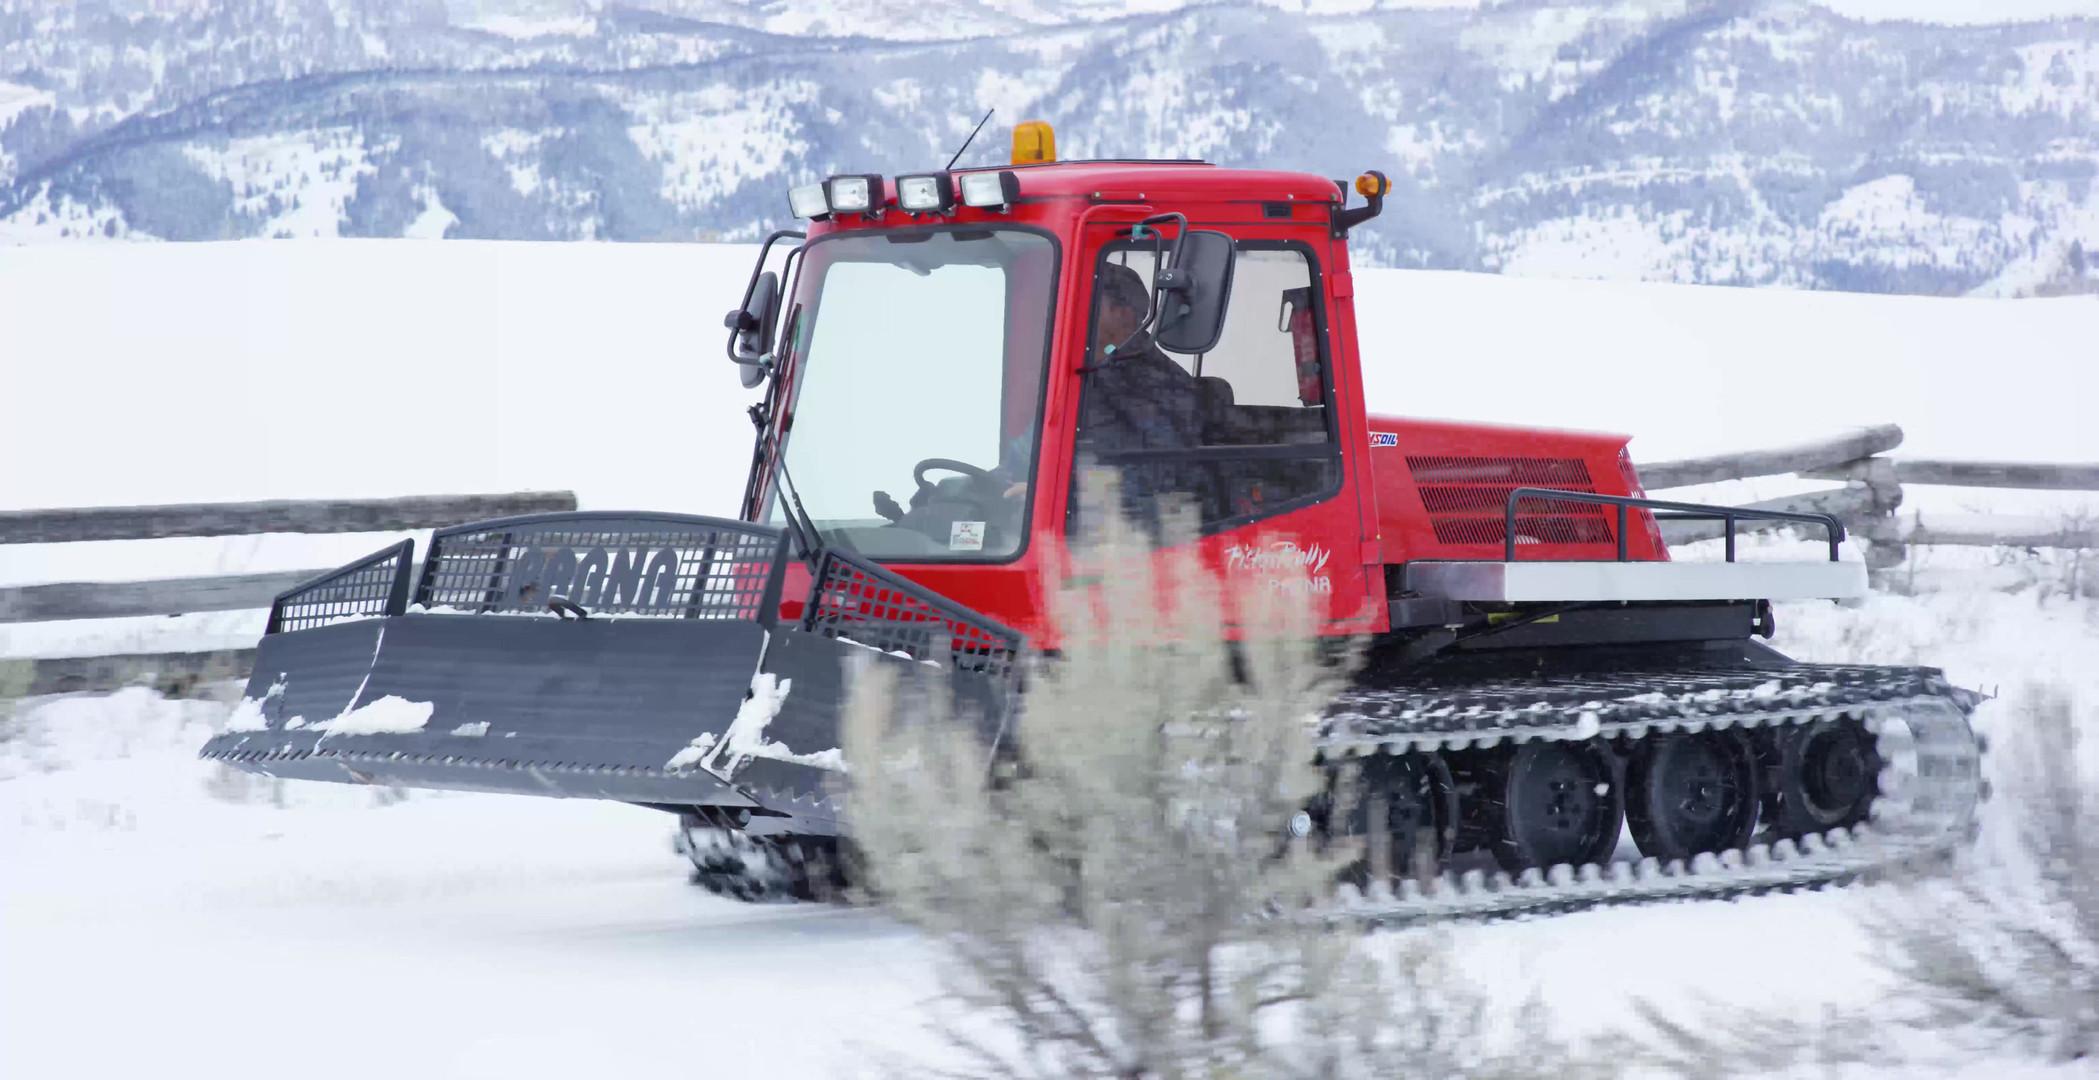 Nordic Ski Grooming Video.mp4